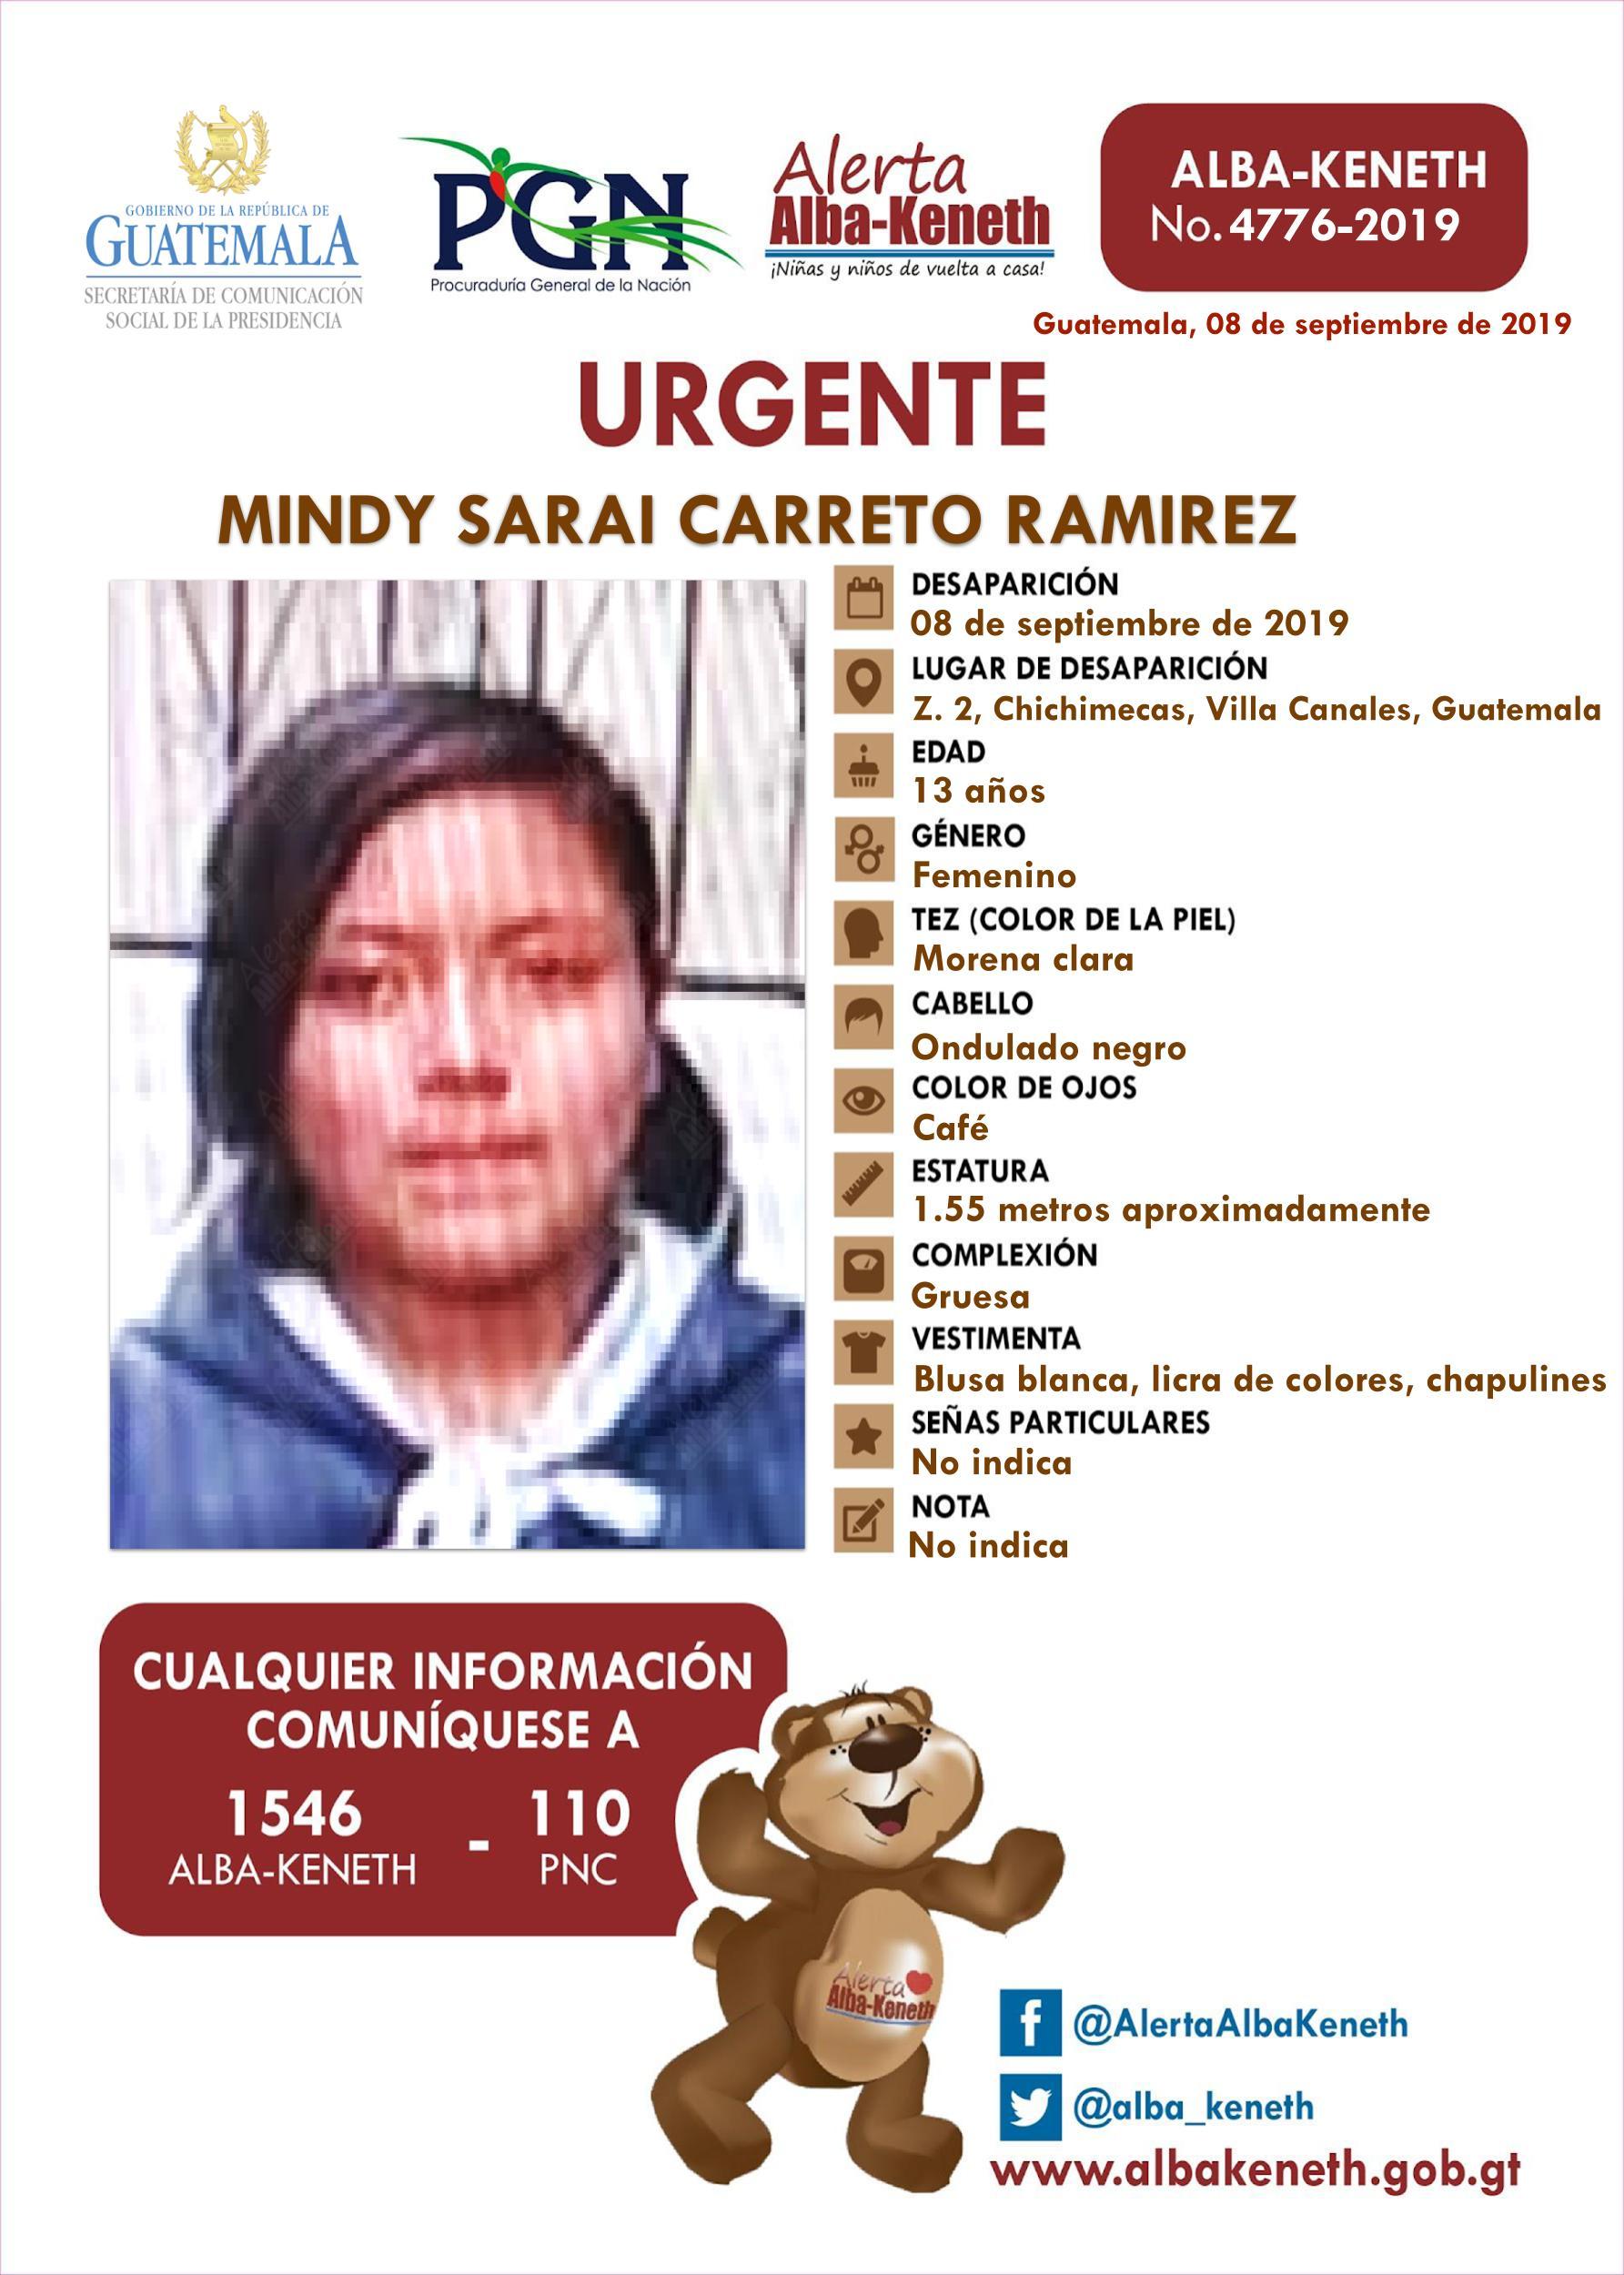 Mindy Sarai Carreto Ramirez